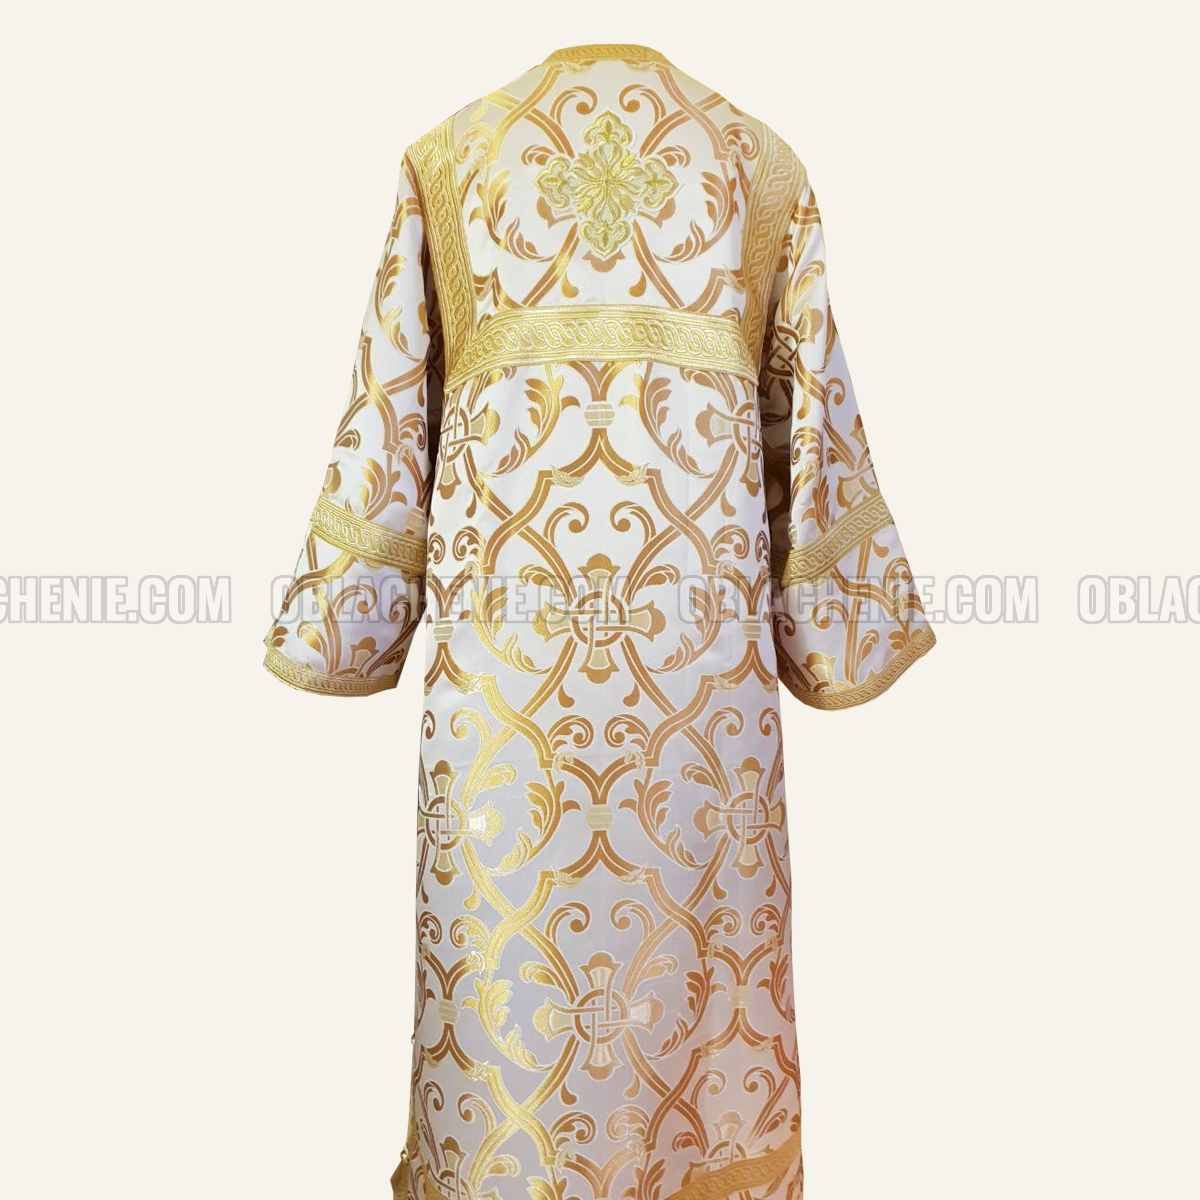 Altar server robes 10333